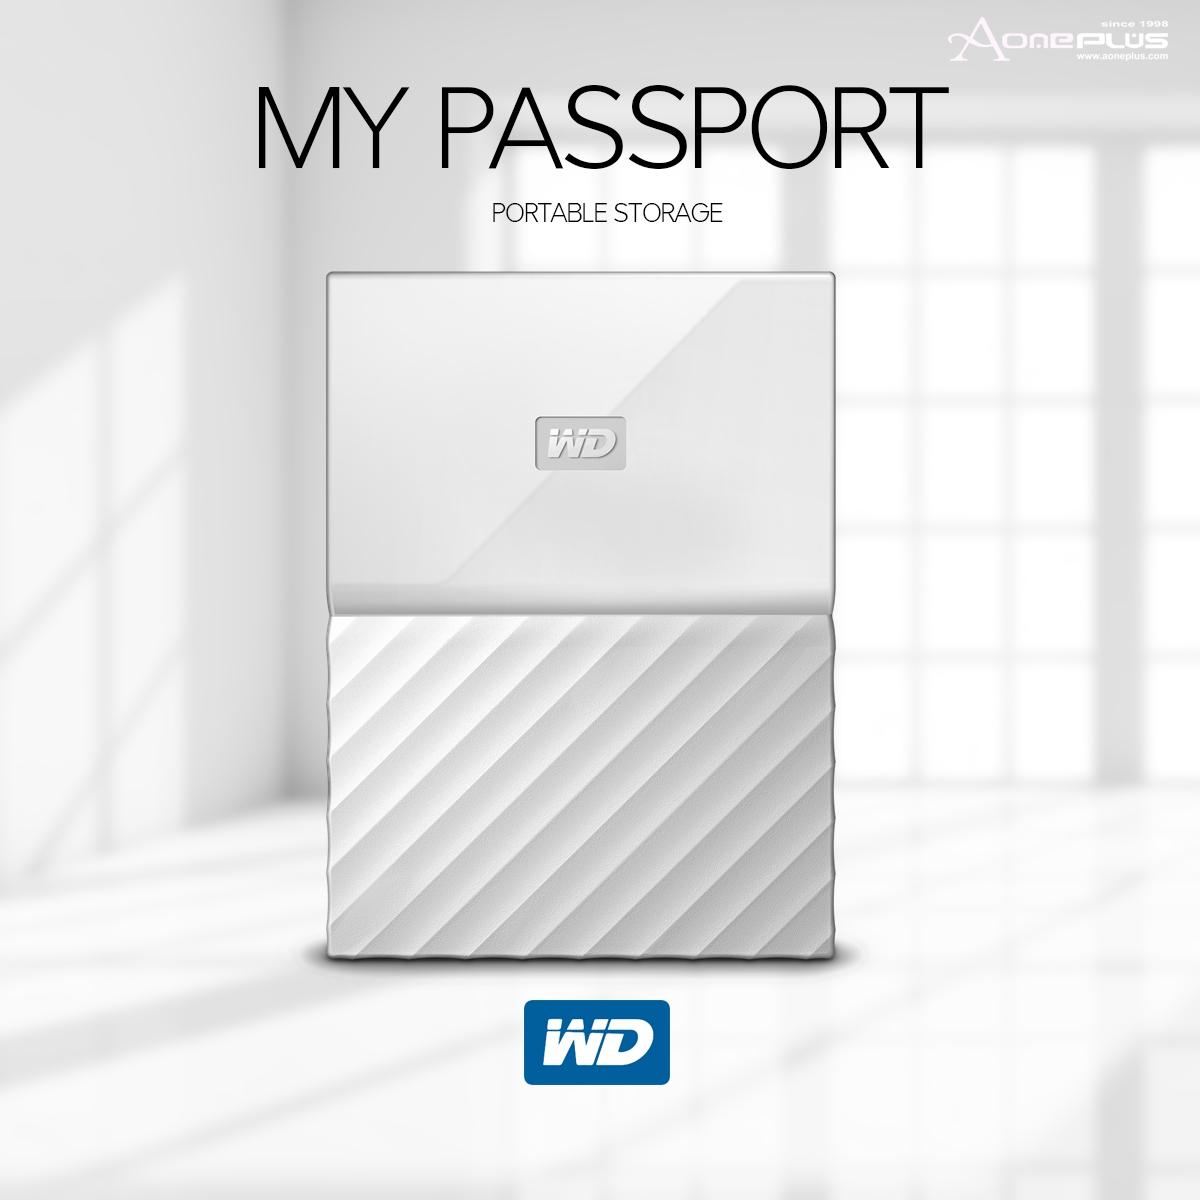 Wd 2tb My Passport 25in Portable Hd End 2 6 2021 1200 Am Ekternal Harddisk Ultra 3tb Free Powerbank Hdd White Wdbyft0020bwt Wesn